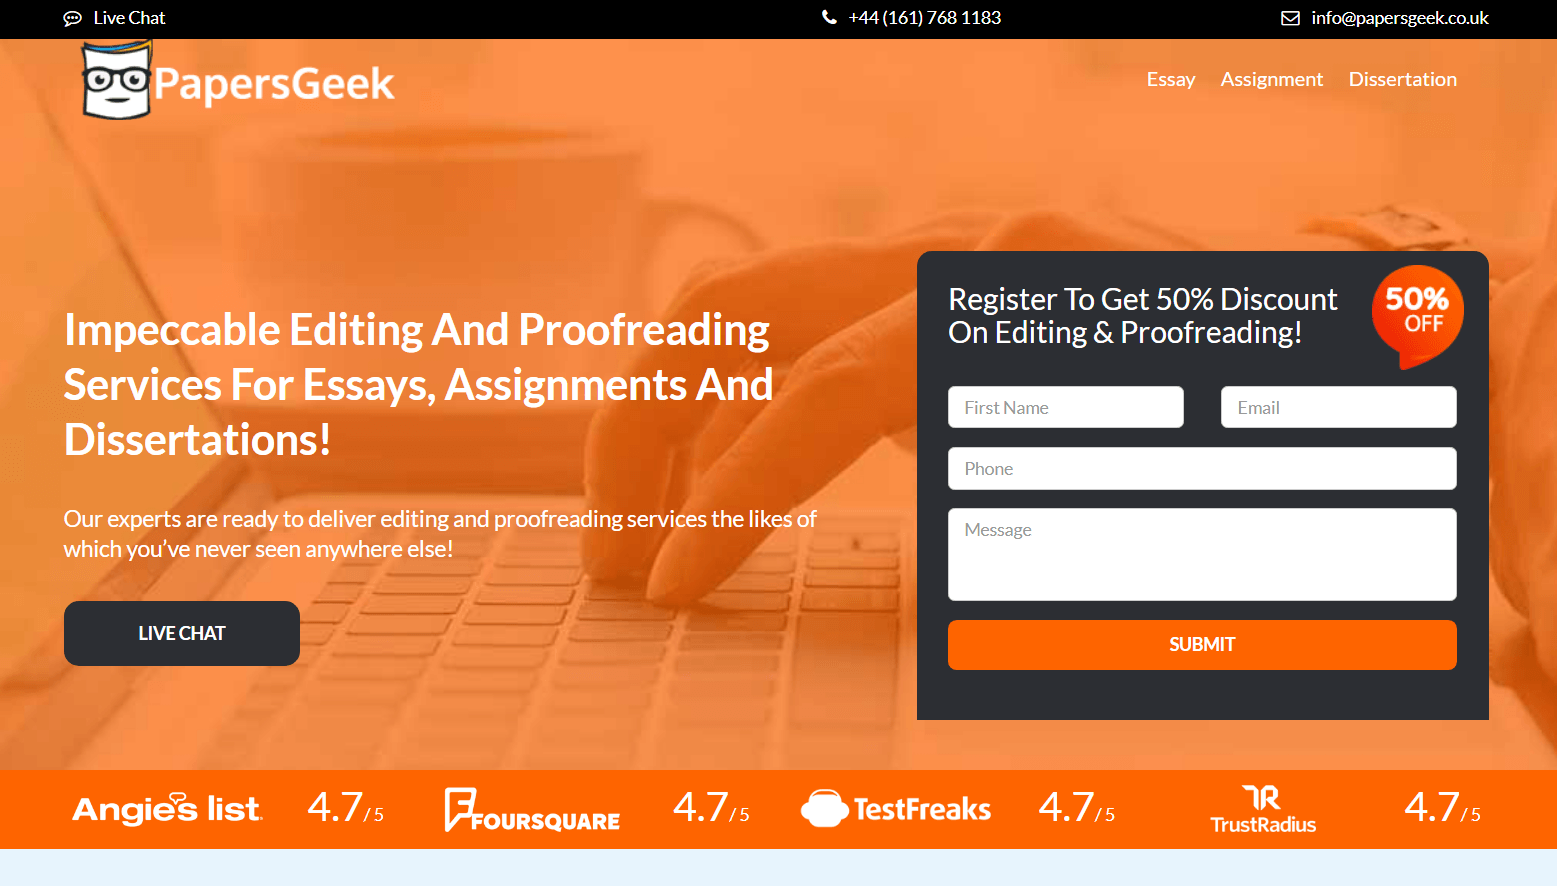 papersgeek.co.uk